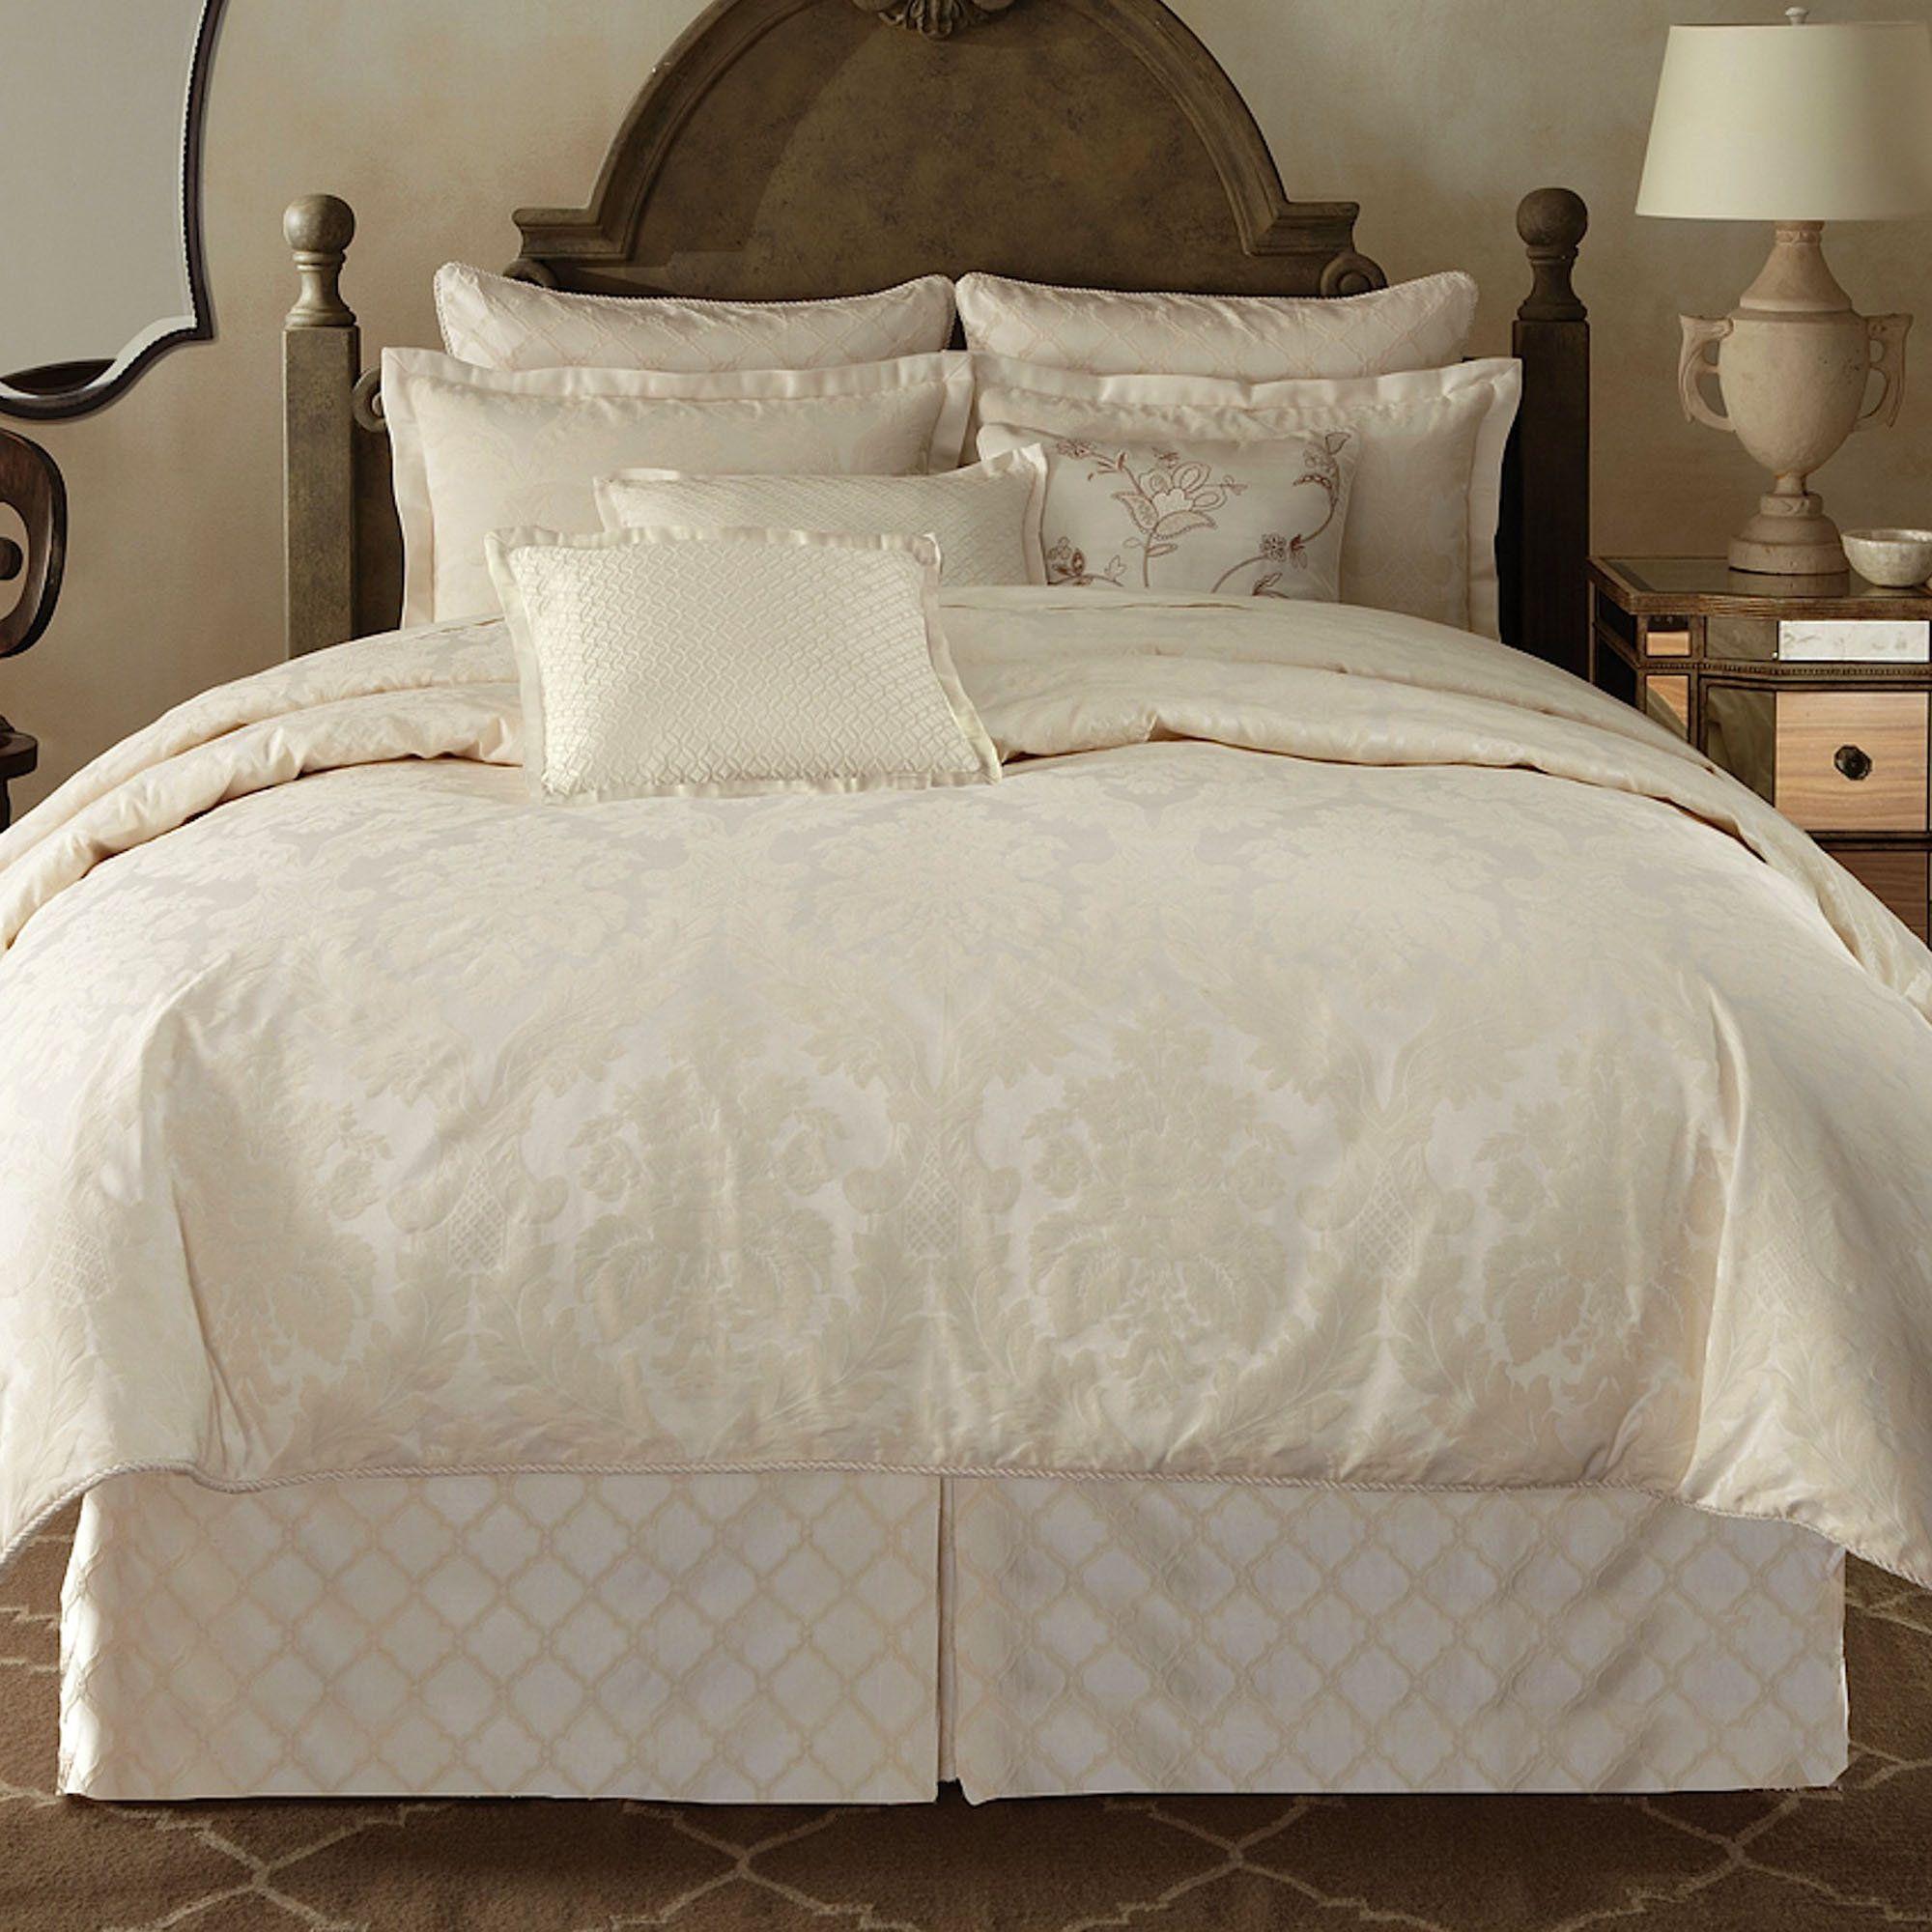 Grandeur Pearl Comforter Bedding by Veratex   Master Bedroom ...